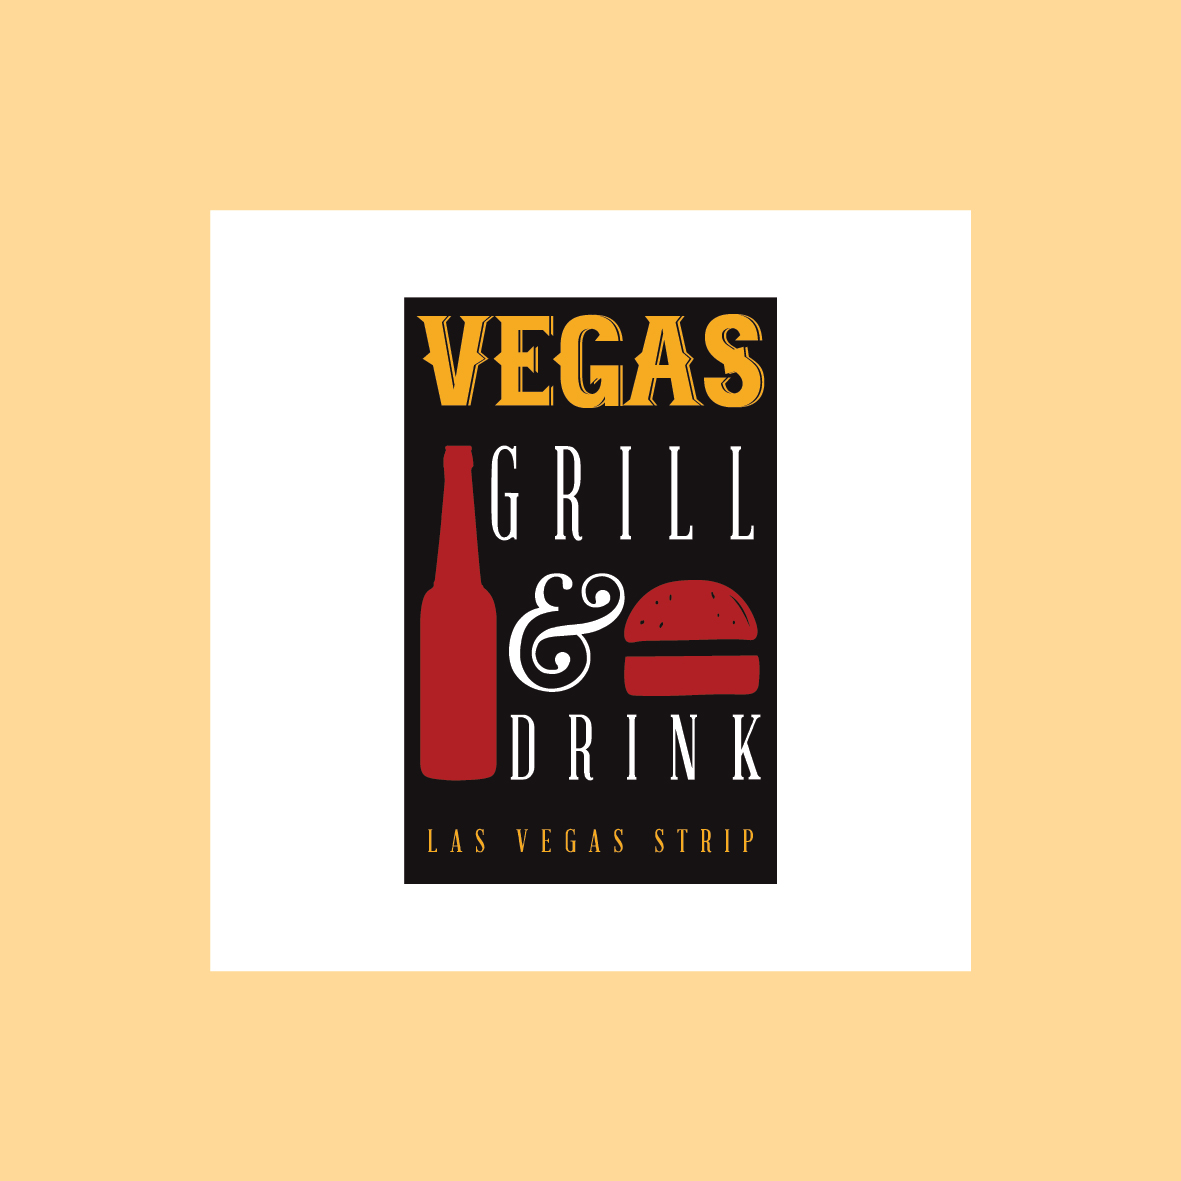 vegas grill e drink logo grafica salerno pub bar